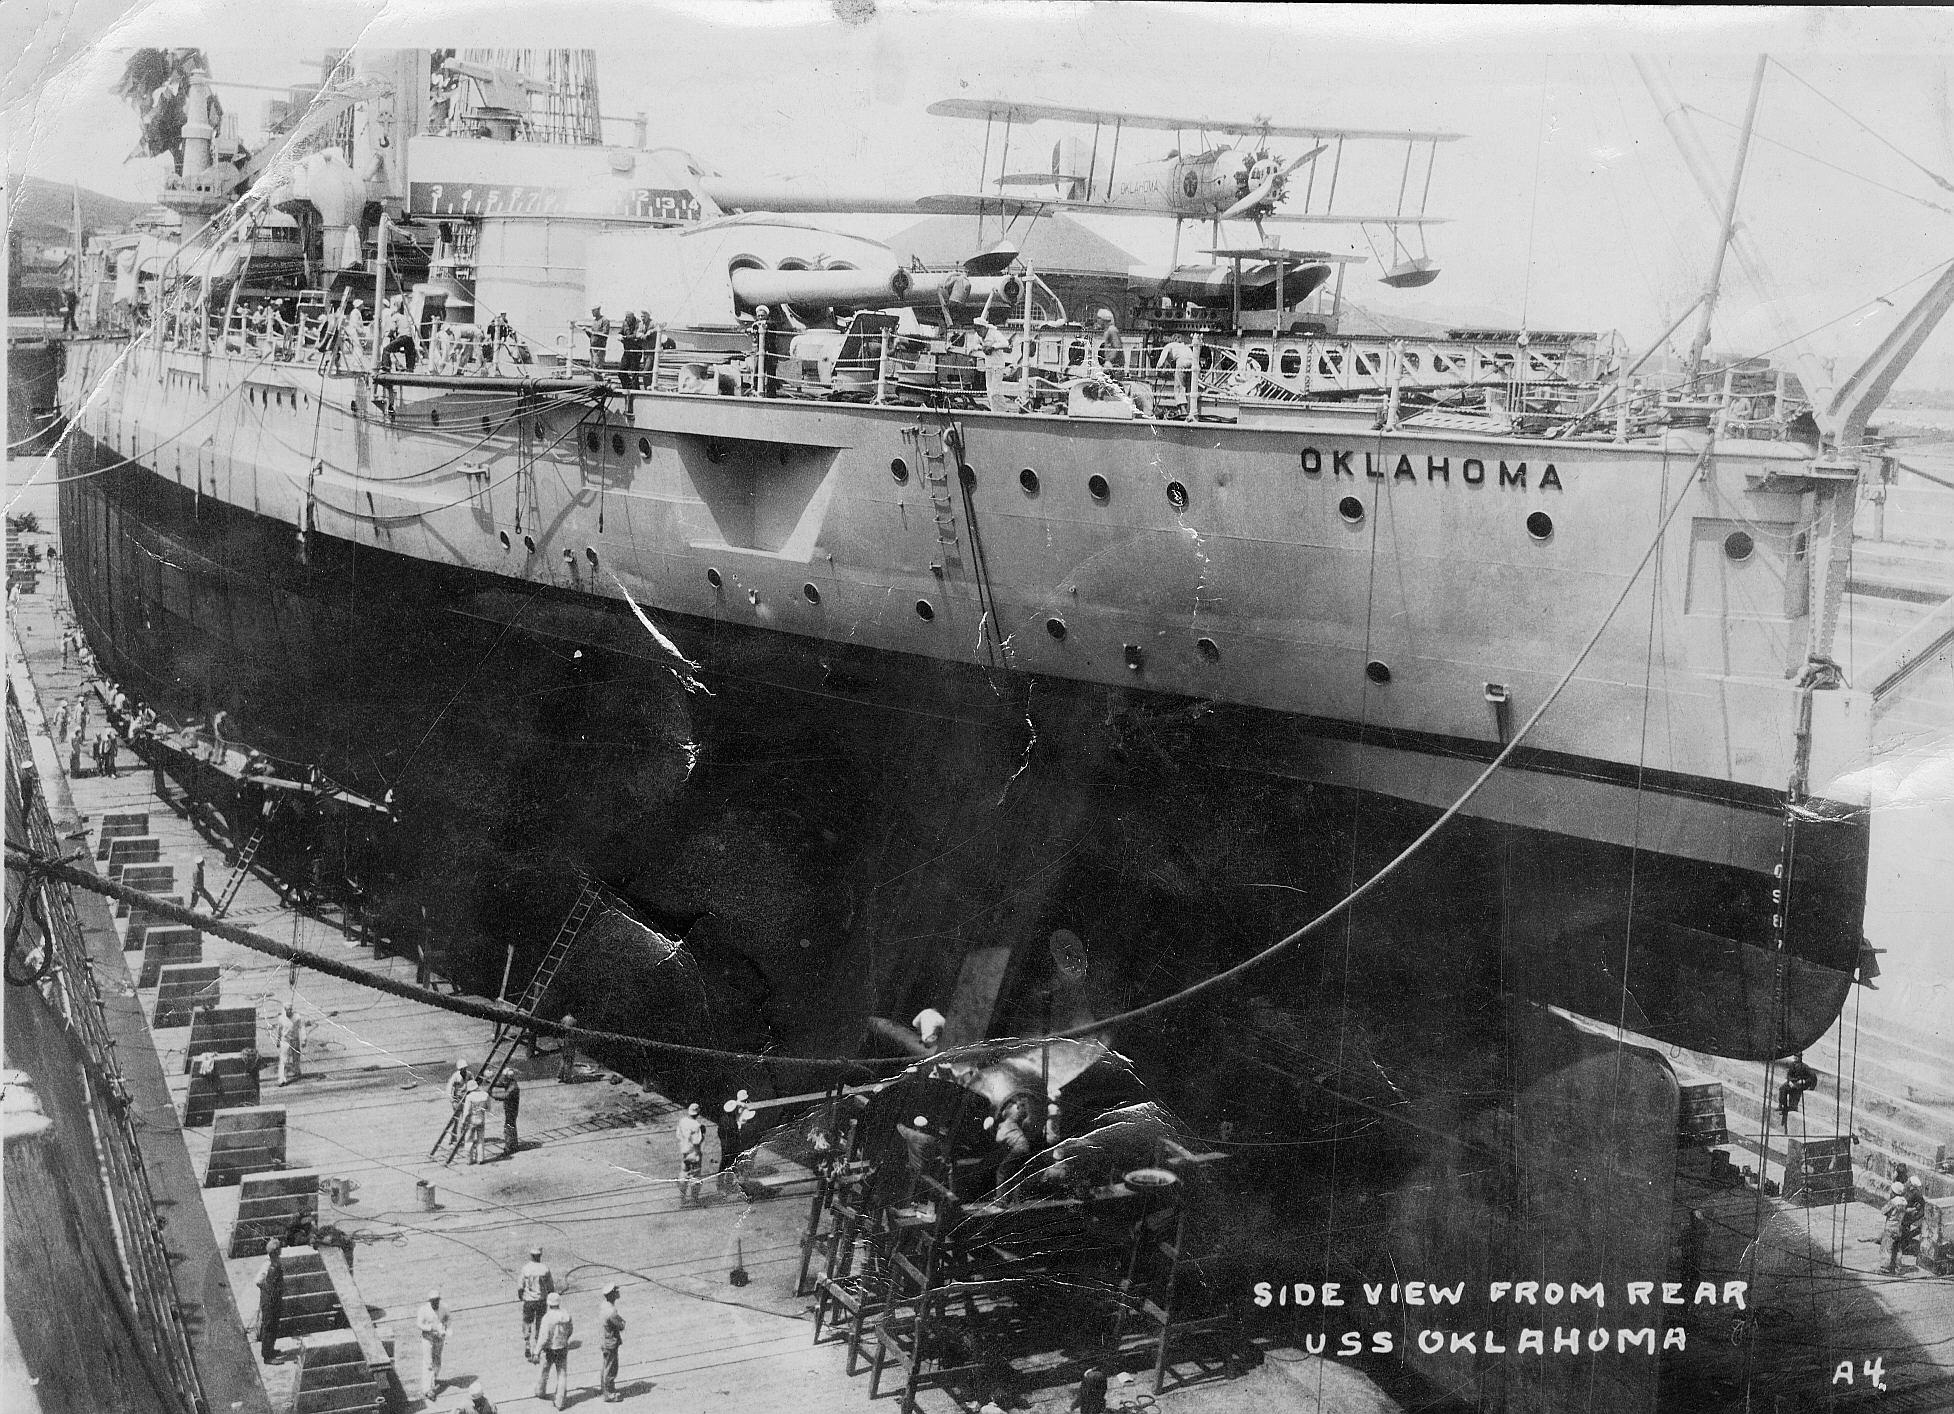 USS_Oklahoma_BB-37_dry_dock_1920s.jpg